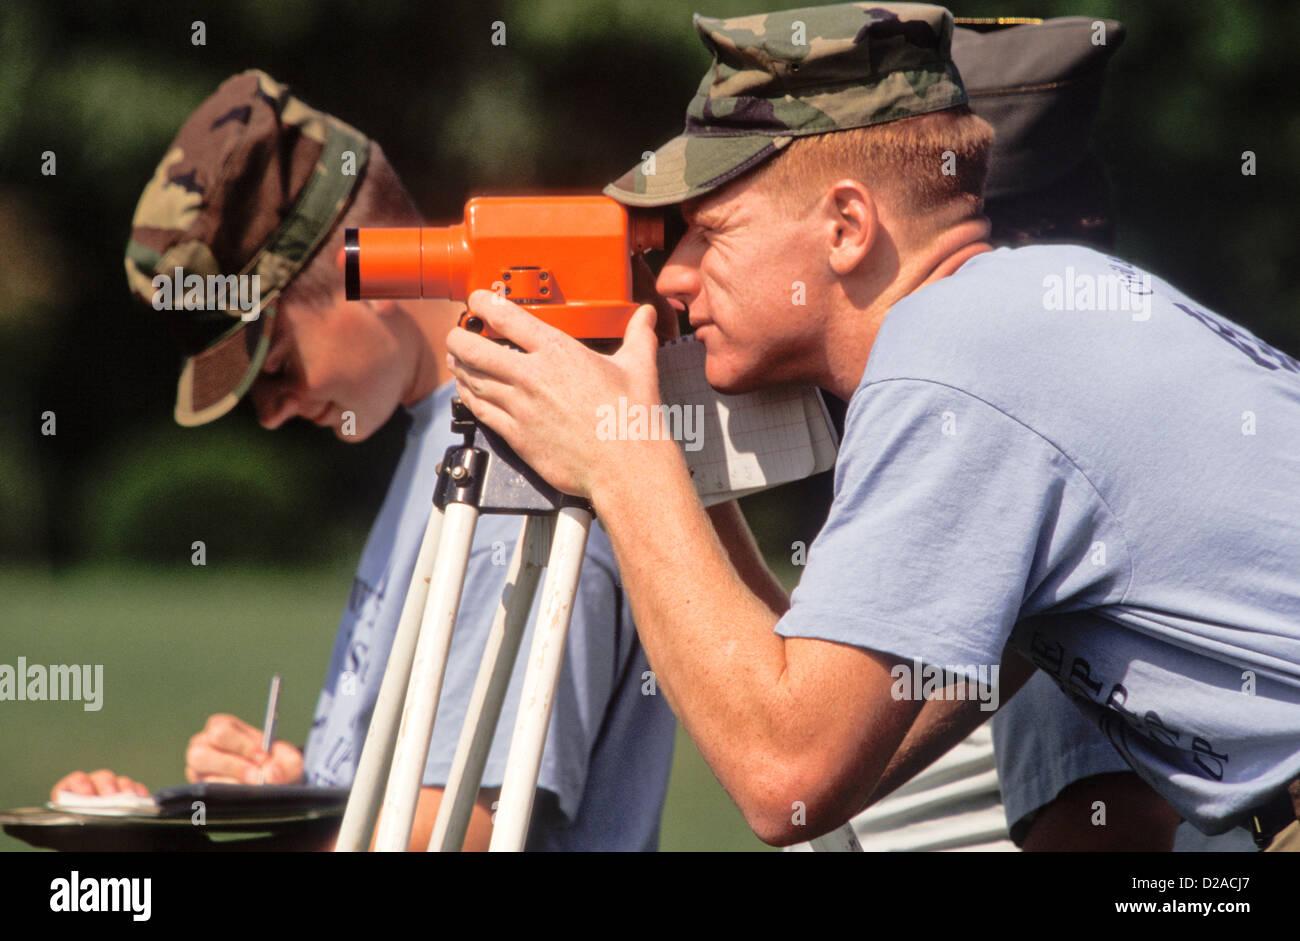 Two Men Doing Surveying Work. Virginia Military Institute, Lexington, Virginia Stock Photo